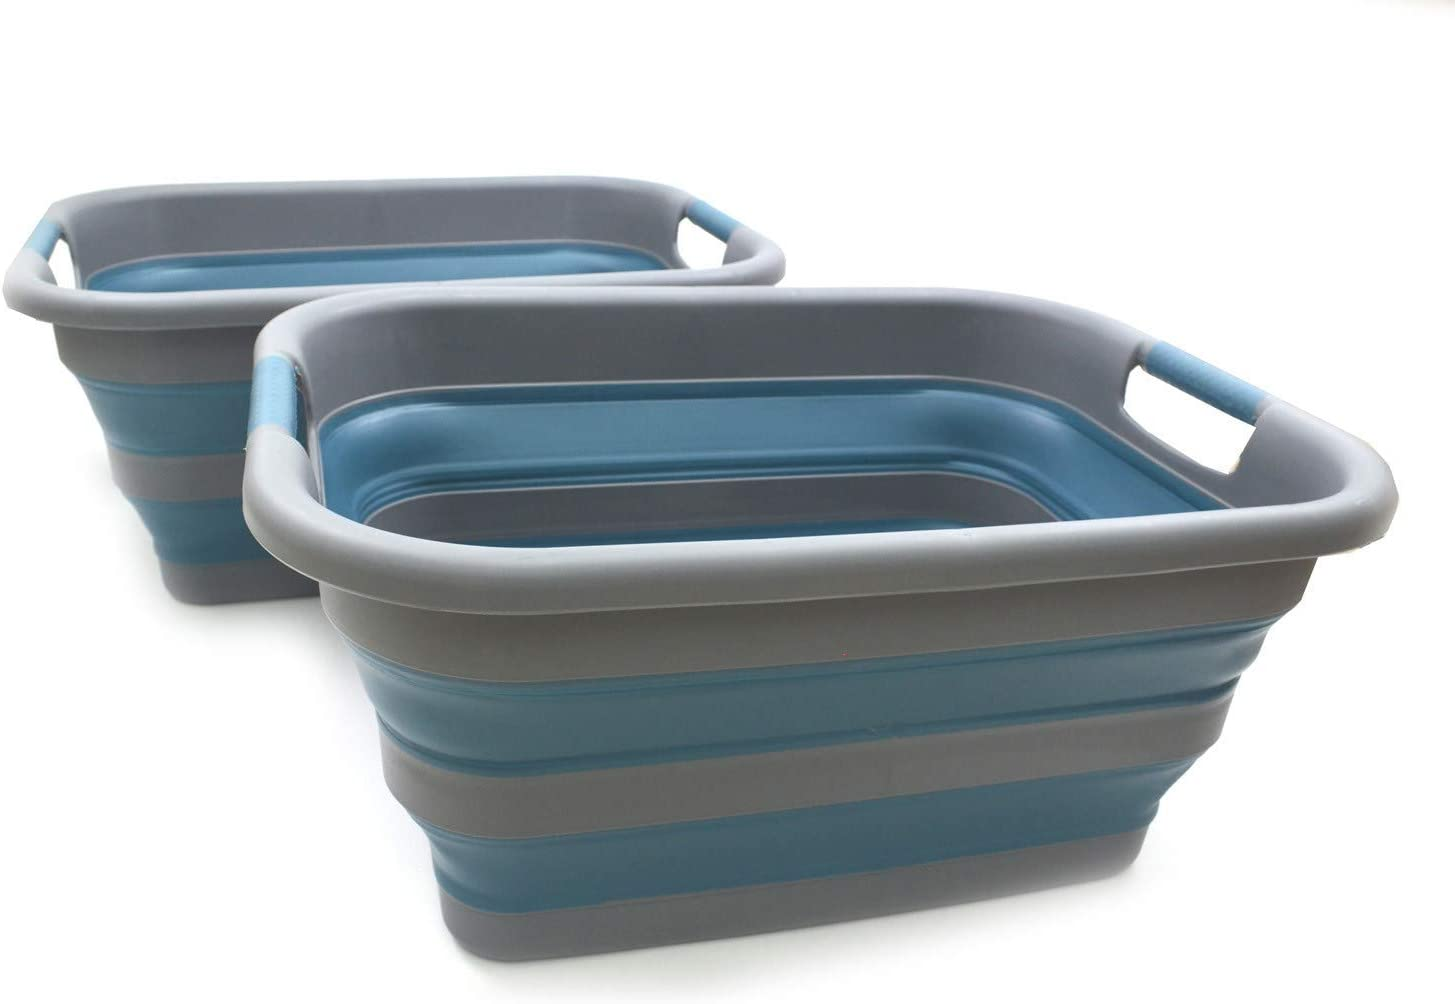 SAMMART Collapsible Plastic Laundry Basket - Foldable Pop Up Storage Container/Organizer - Portable Washing Tub - Space Saving Hamper/Basket (2, Grey/Deep Blue)